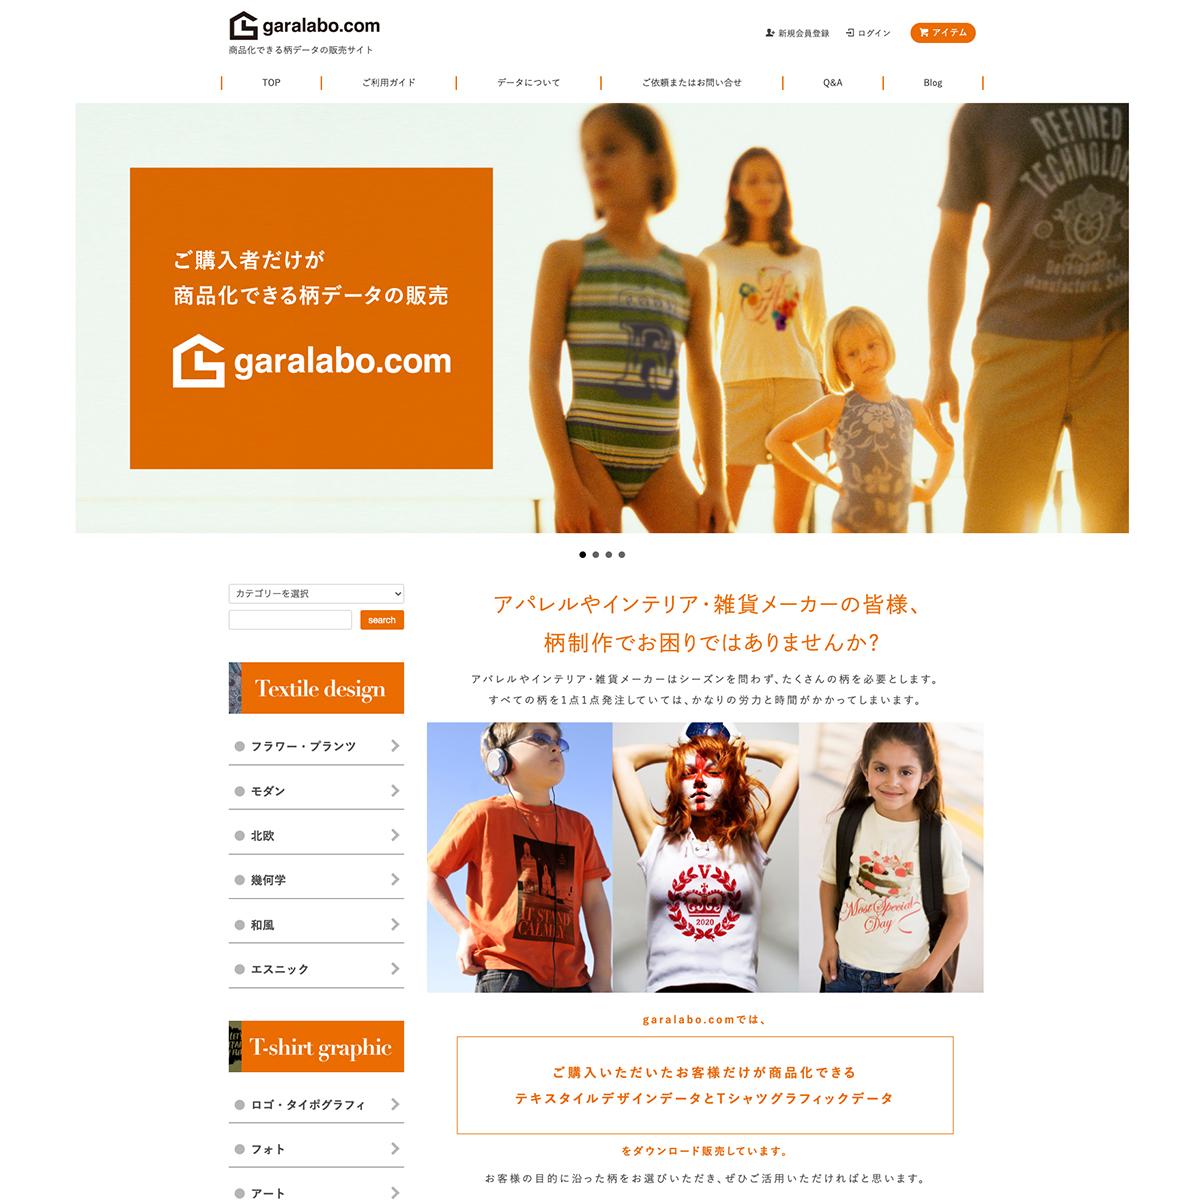 garalabo.com